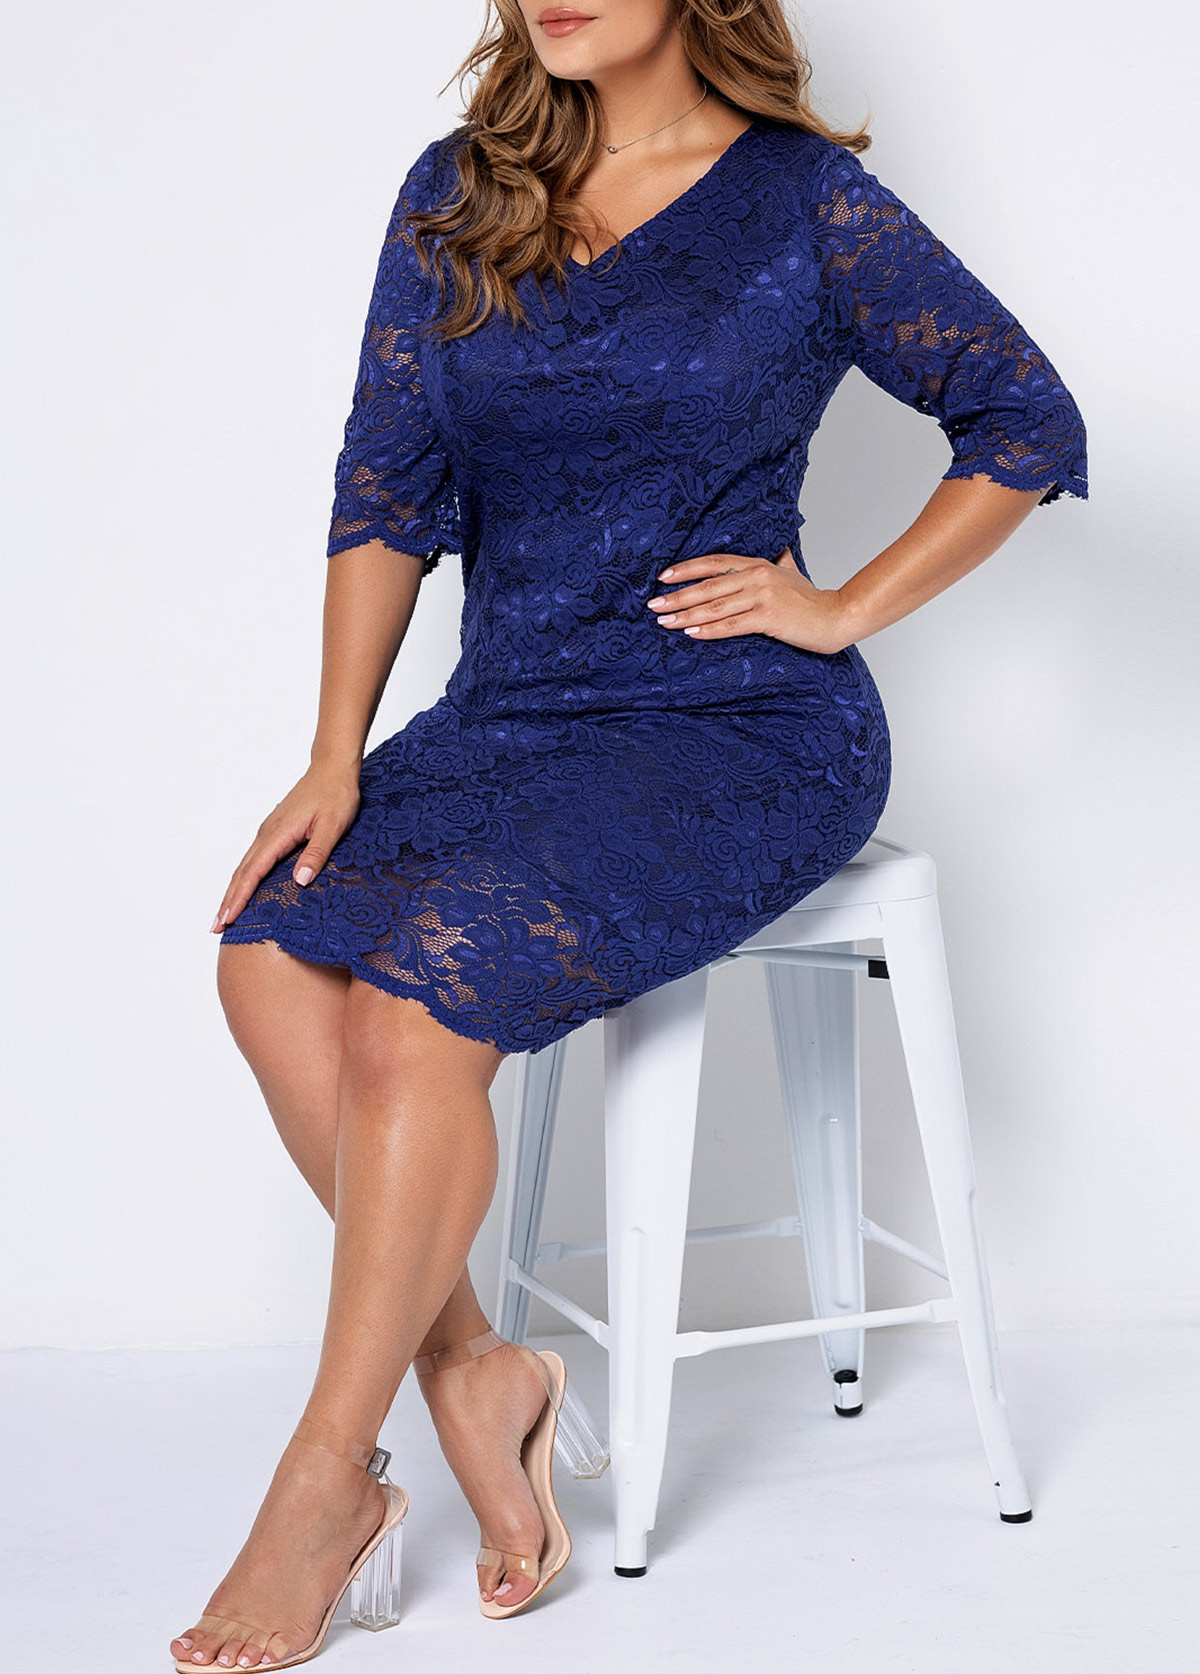 Plus Size V Neck 3/4 Sleeve Lace Dress